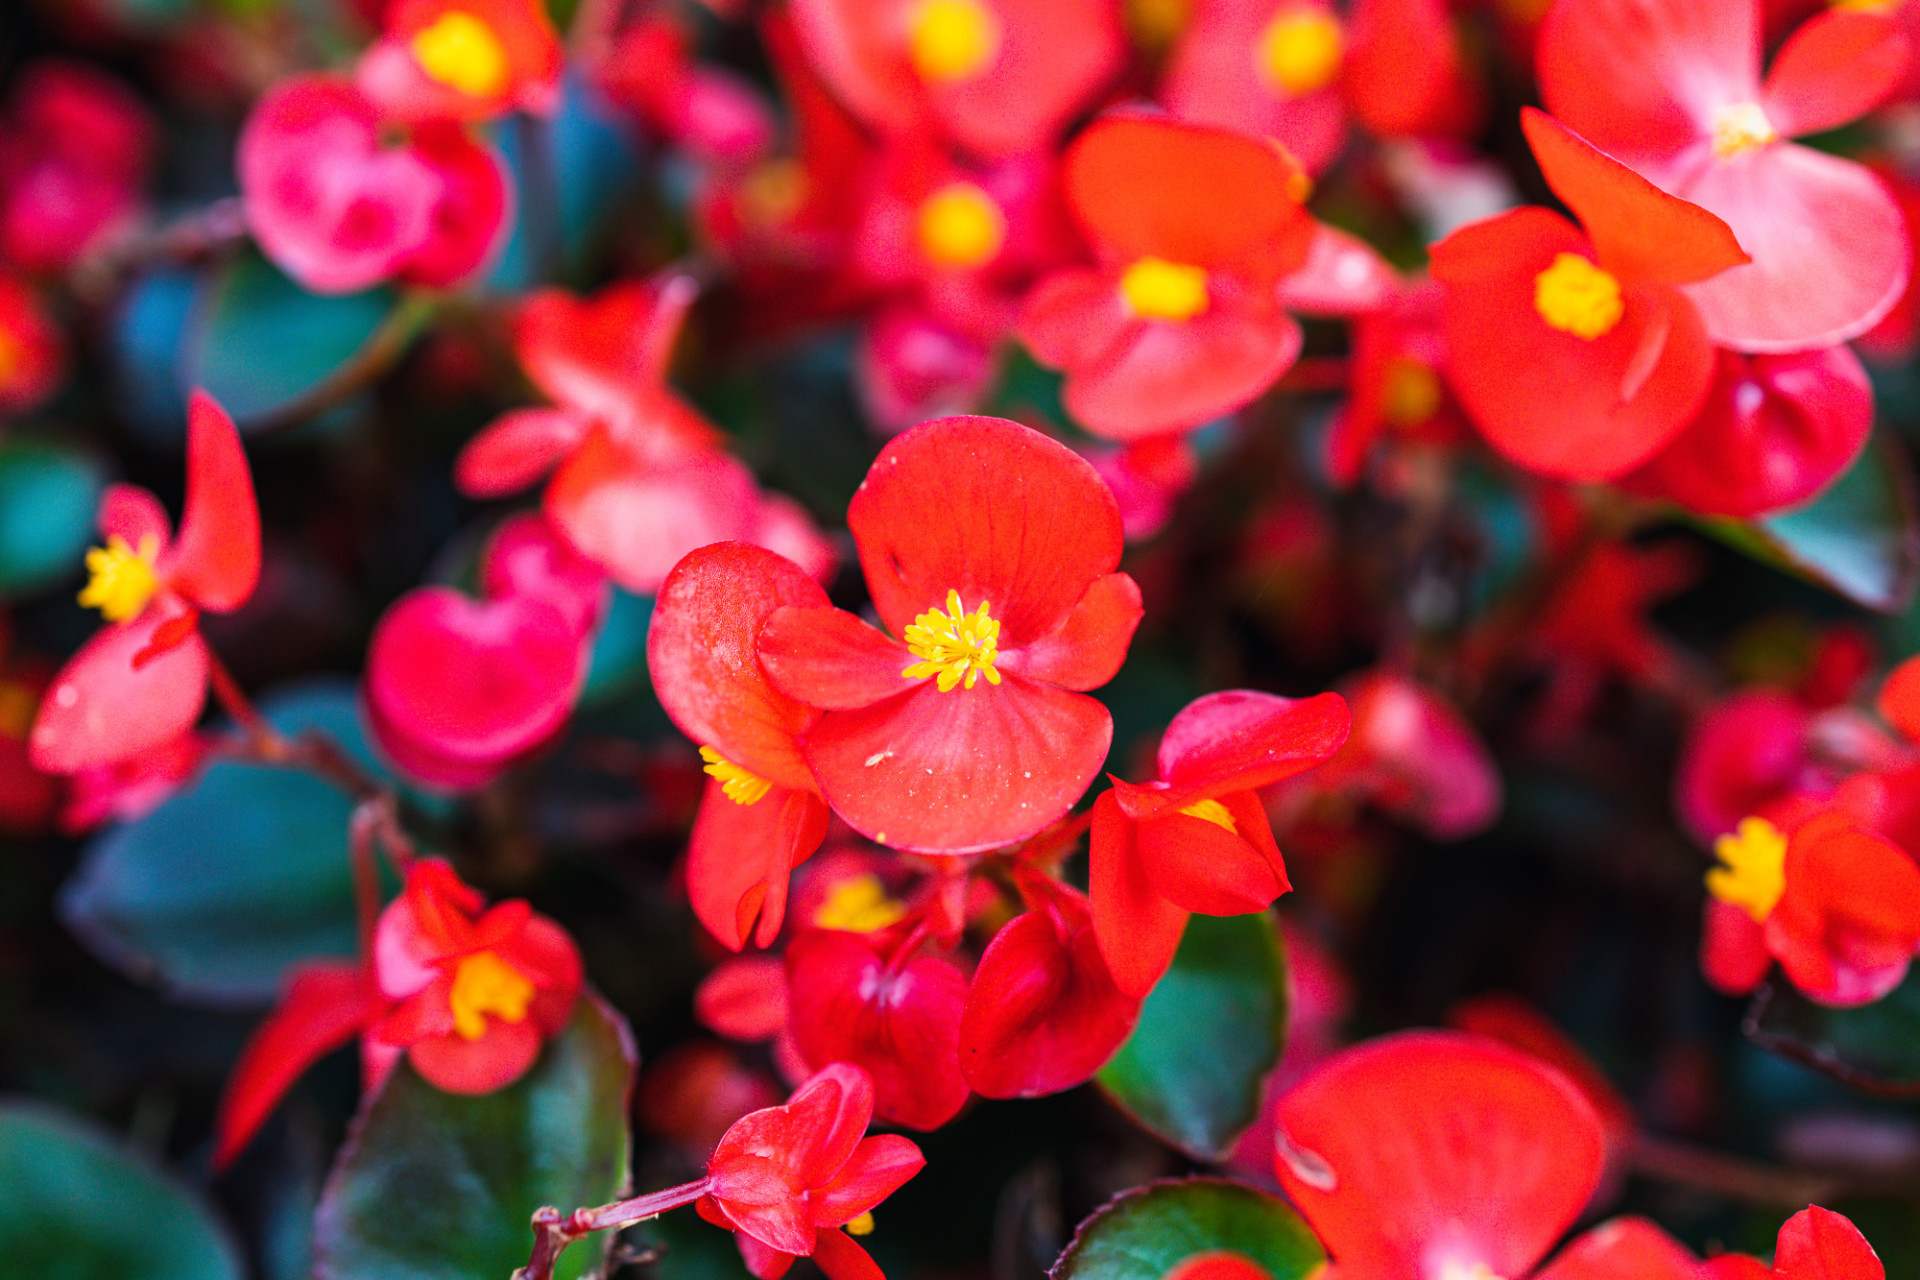 Red Wax begonia Flowers